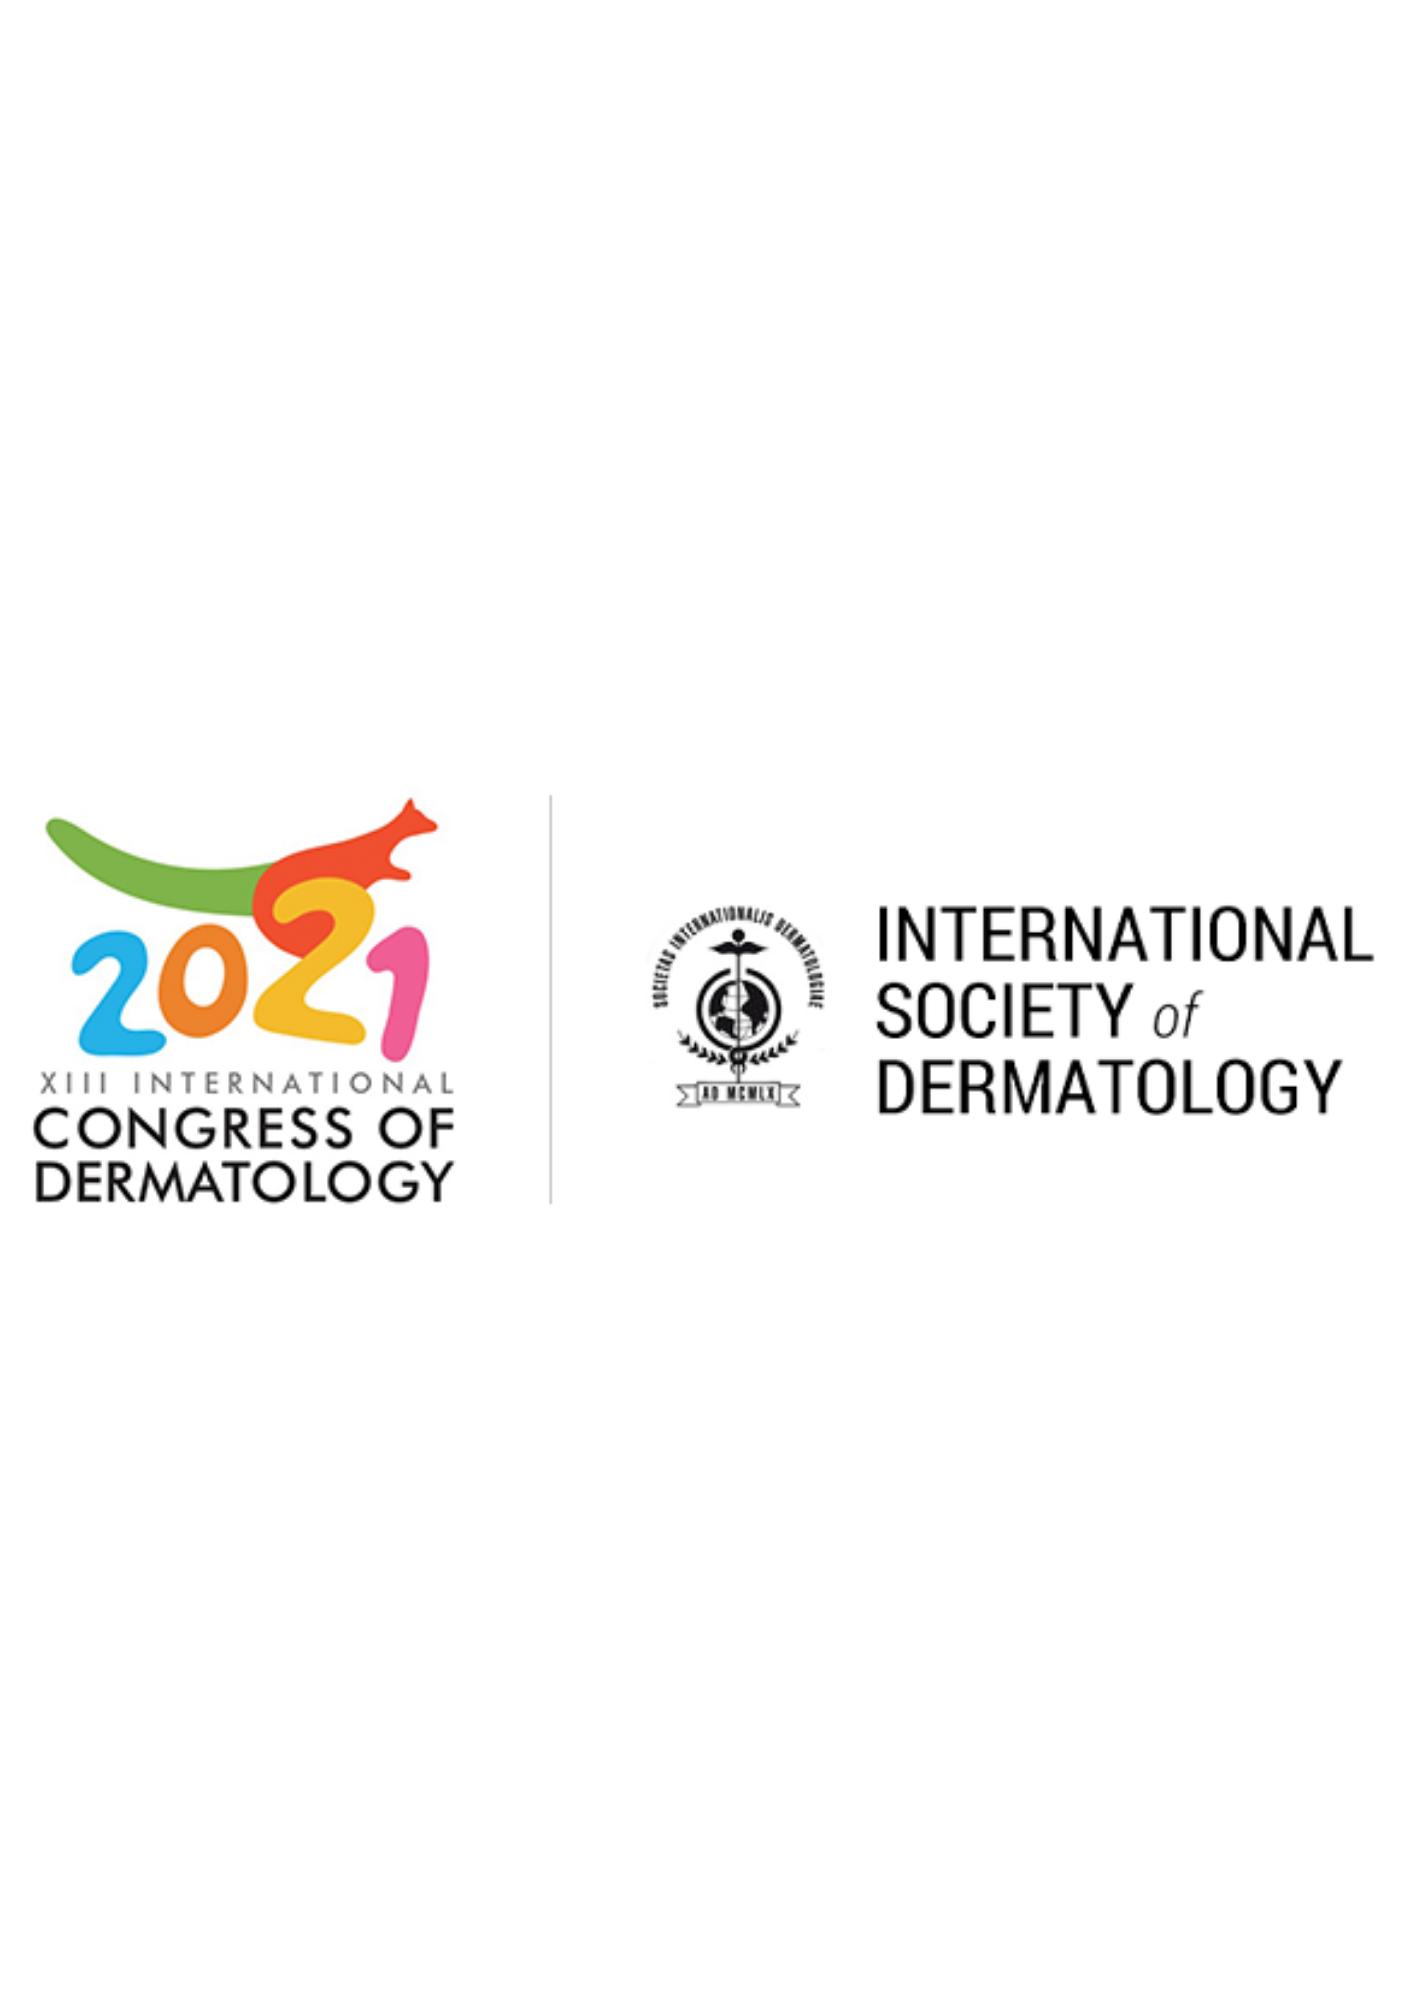 XIII International Congress of Dermatology 2021